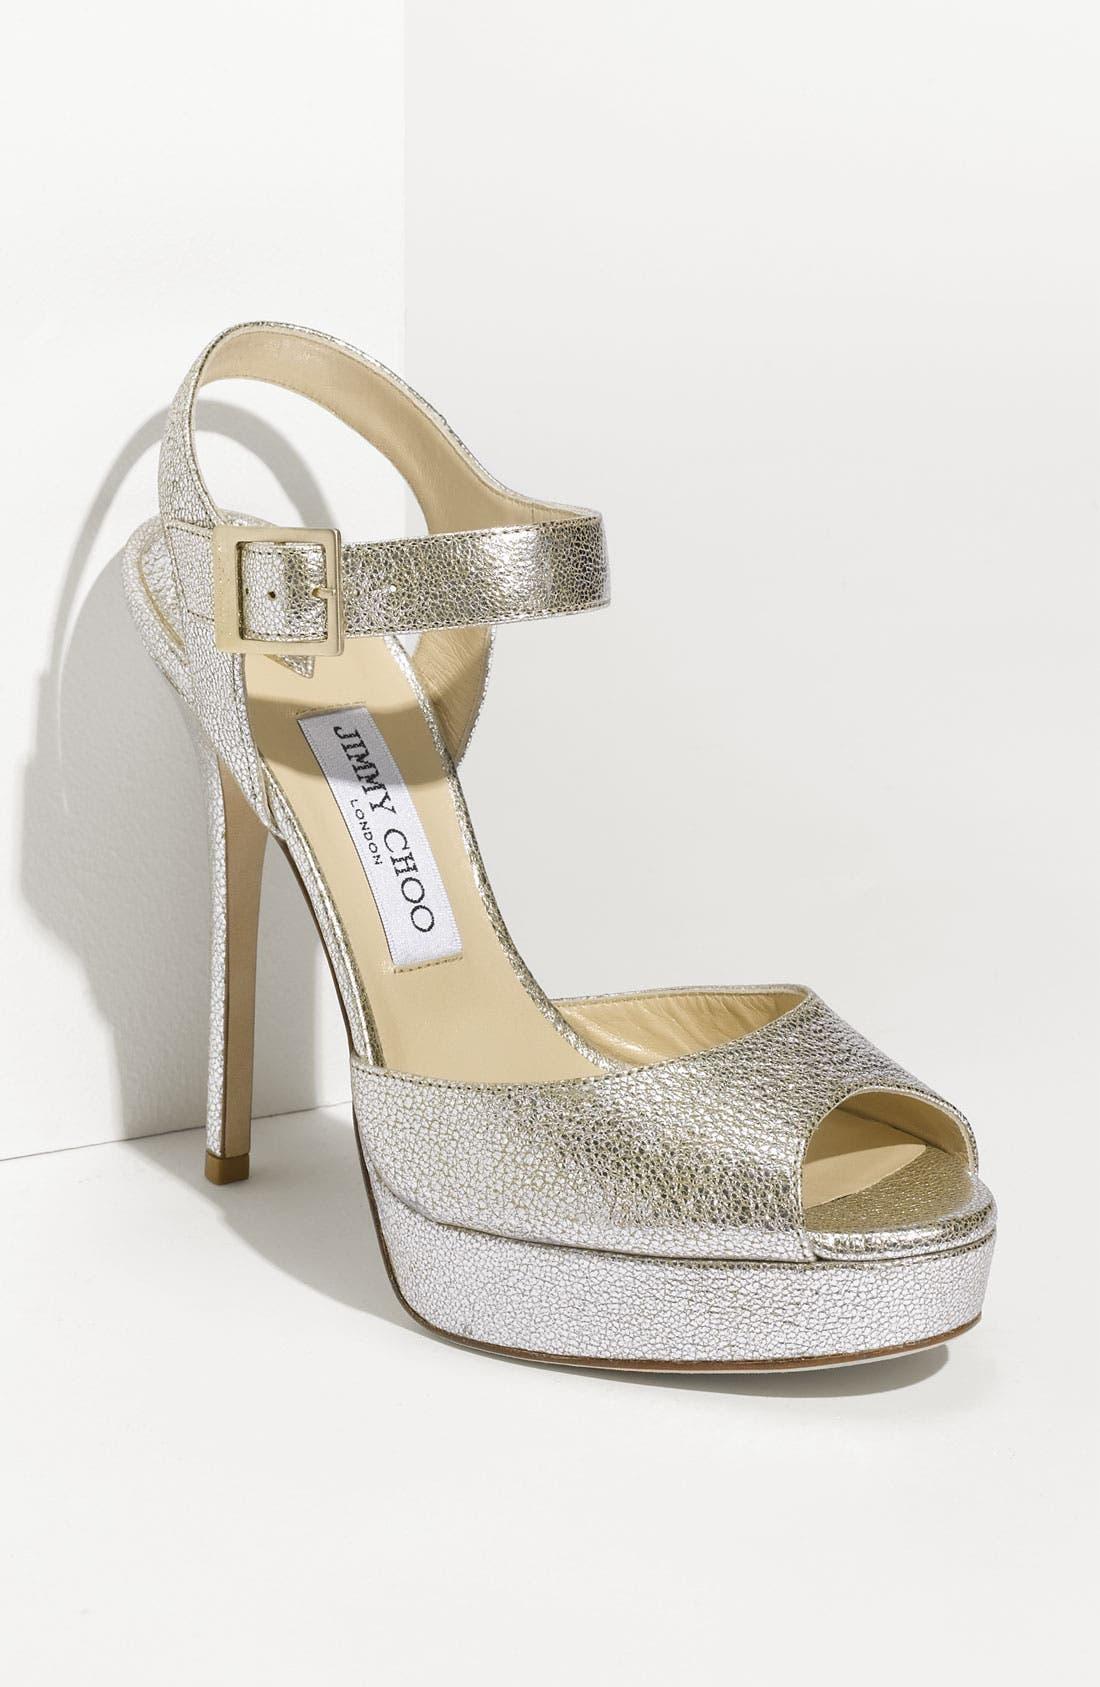 Main Image - Jimmy Choo 'Linda' Sandal (Exclusive Color)